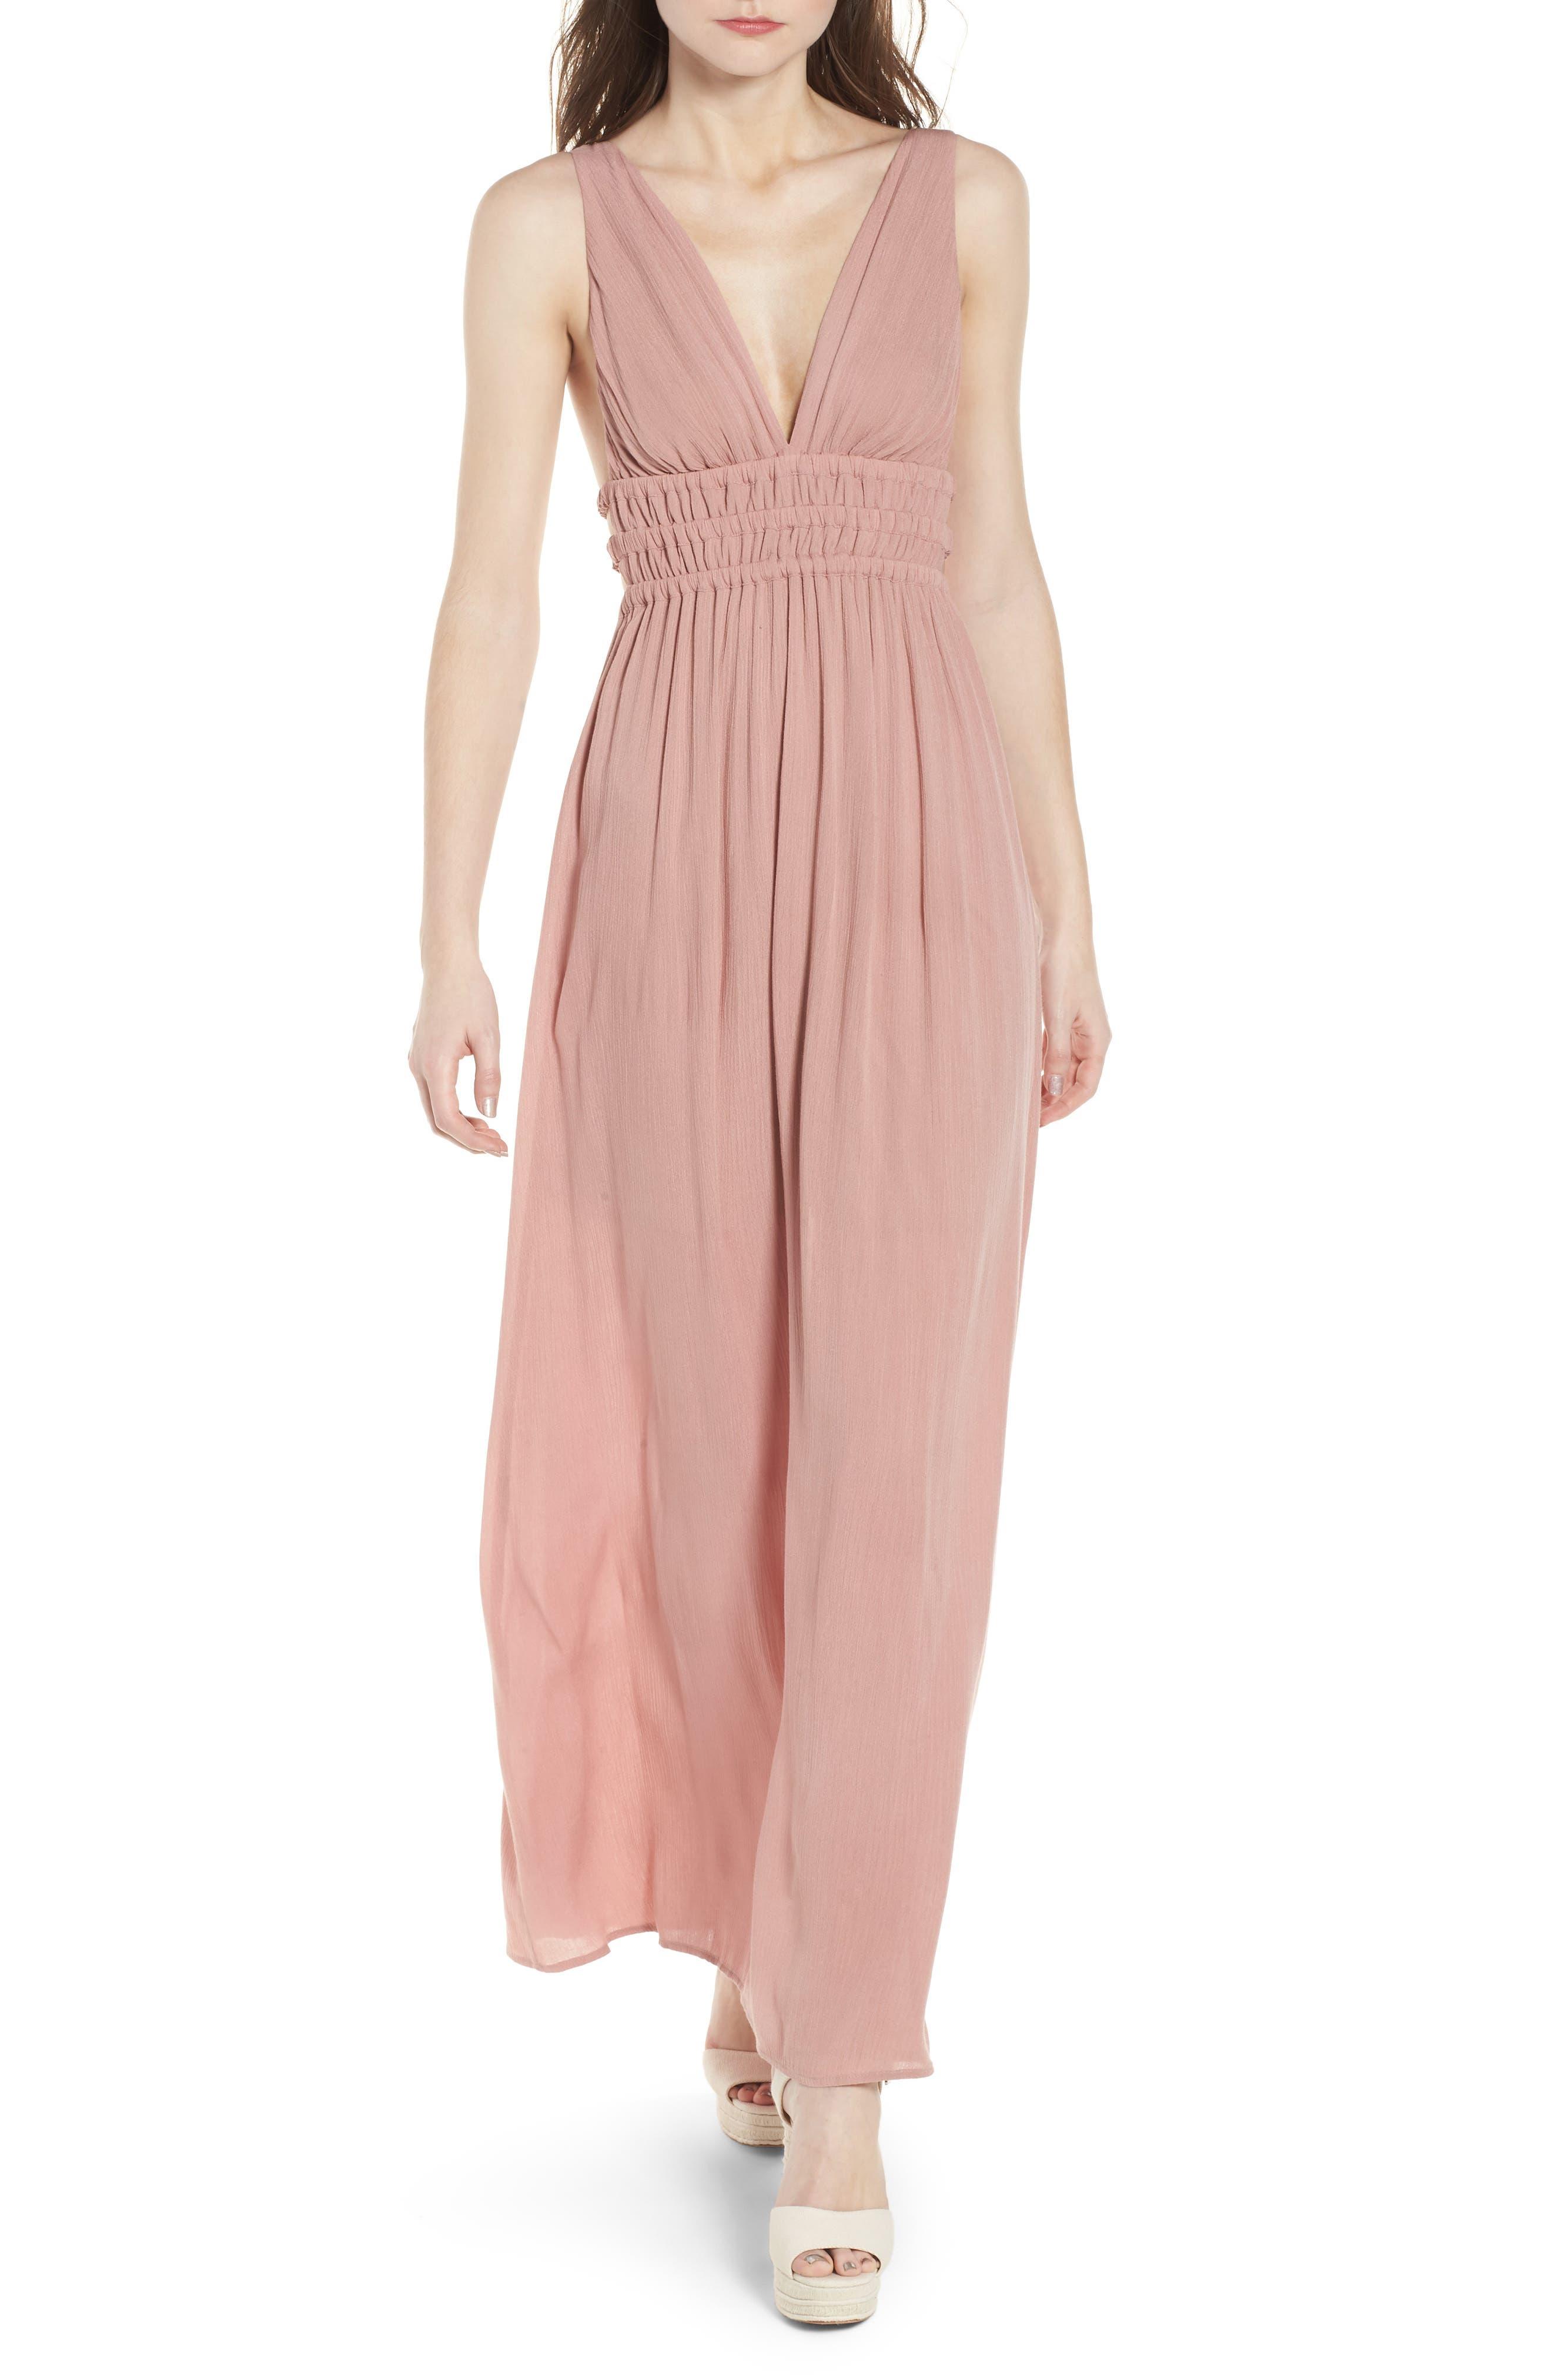 Surrey Maxi Dress,                             Main thumbnail 1, color,                             Nude Rose